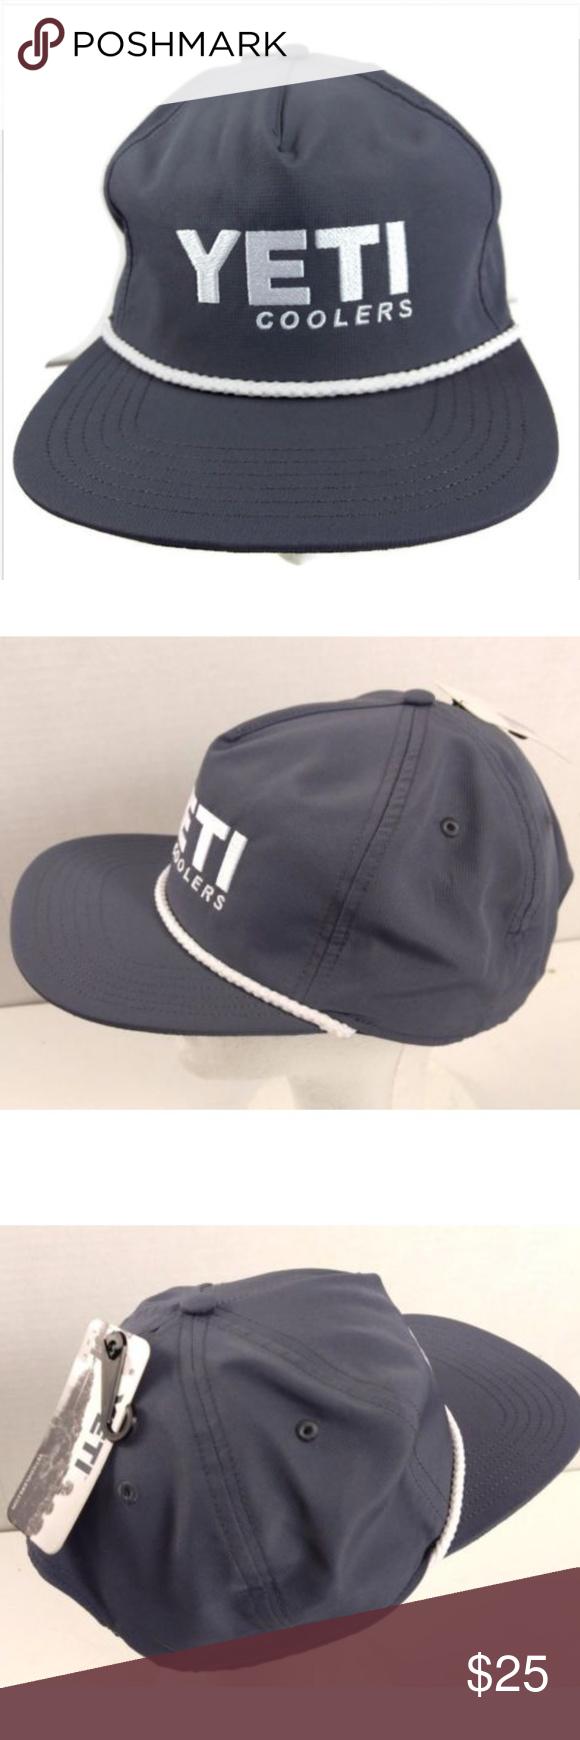 72c7bf0bf8bba Yeti trucker style rope hat slate grey Yeti coolers trucker style rope hat  slate grey snapback